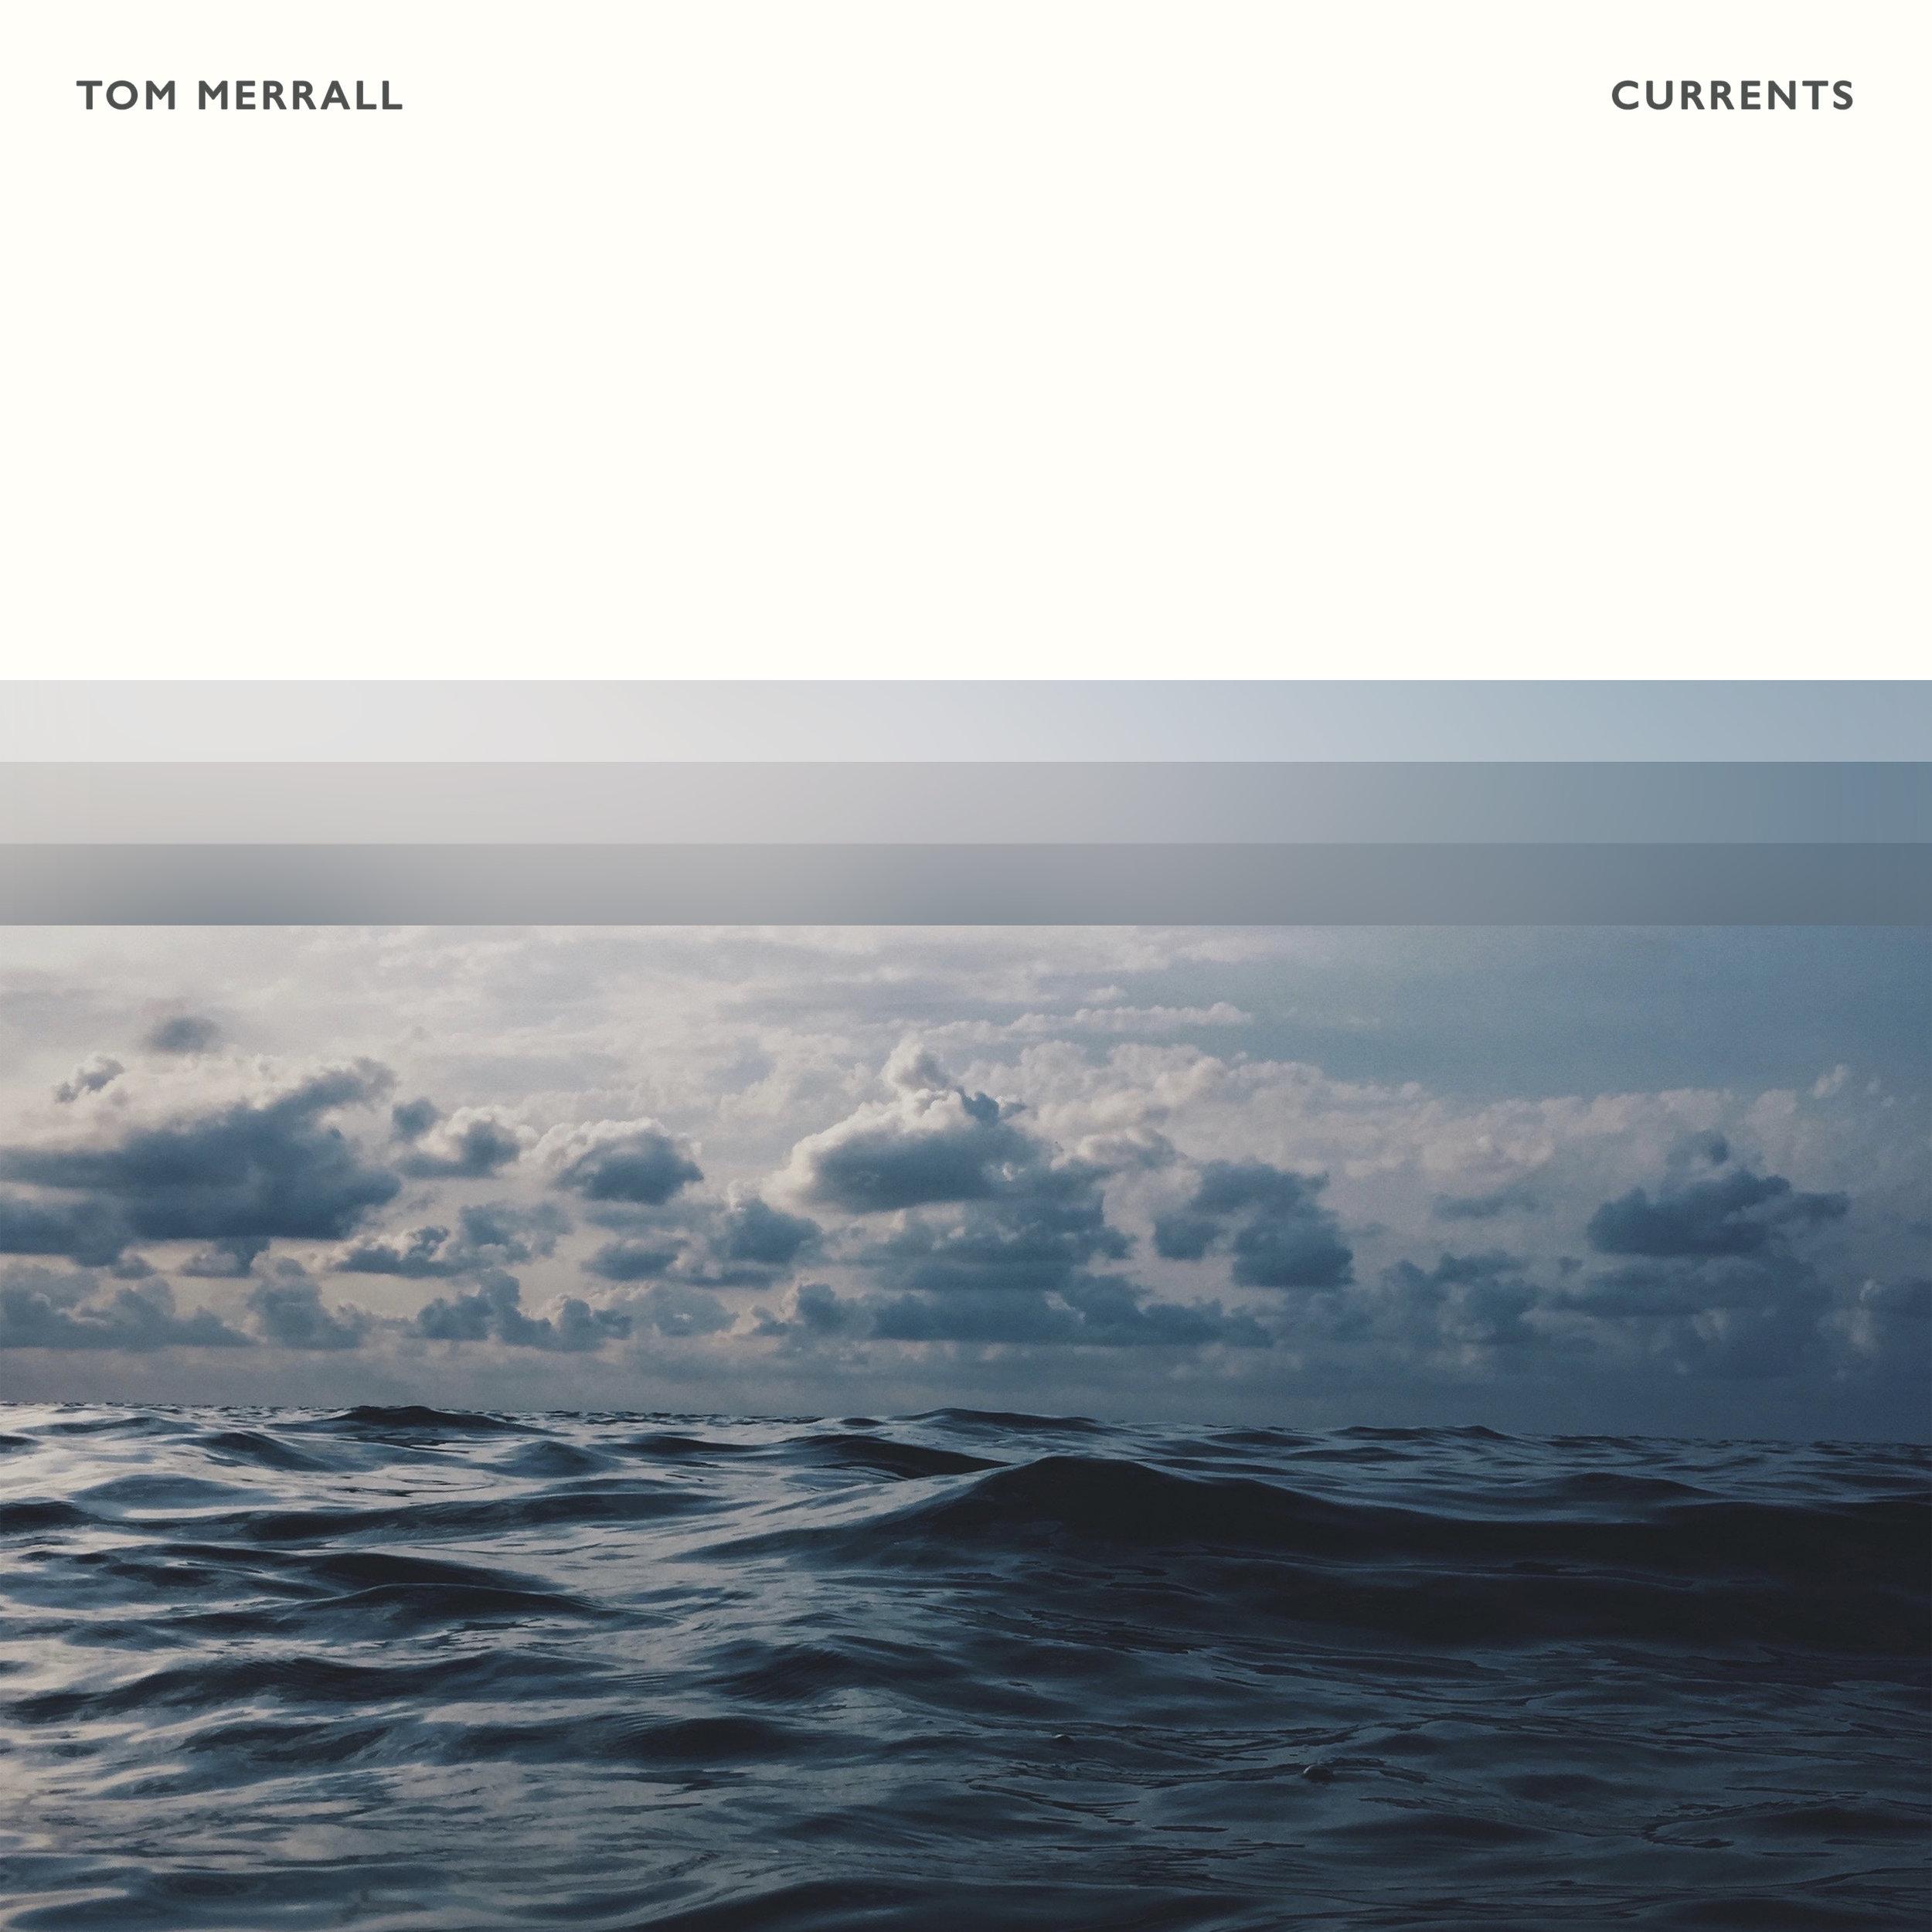 Tom Merrall - Currents